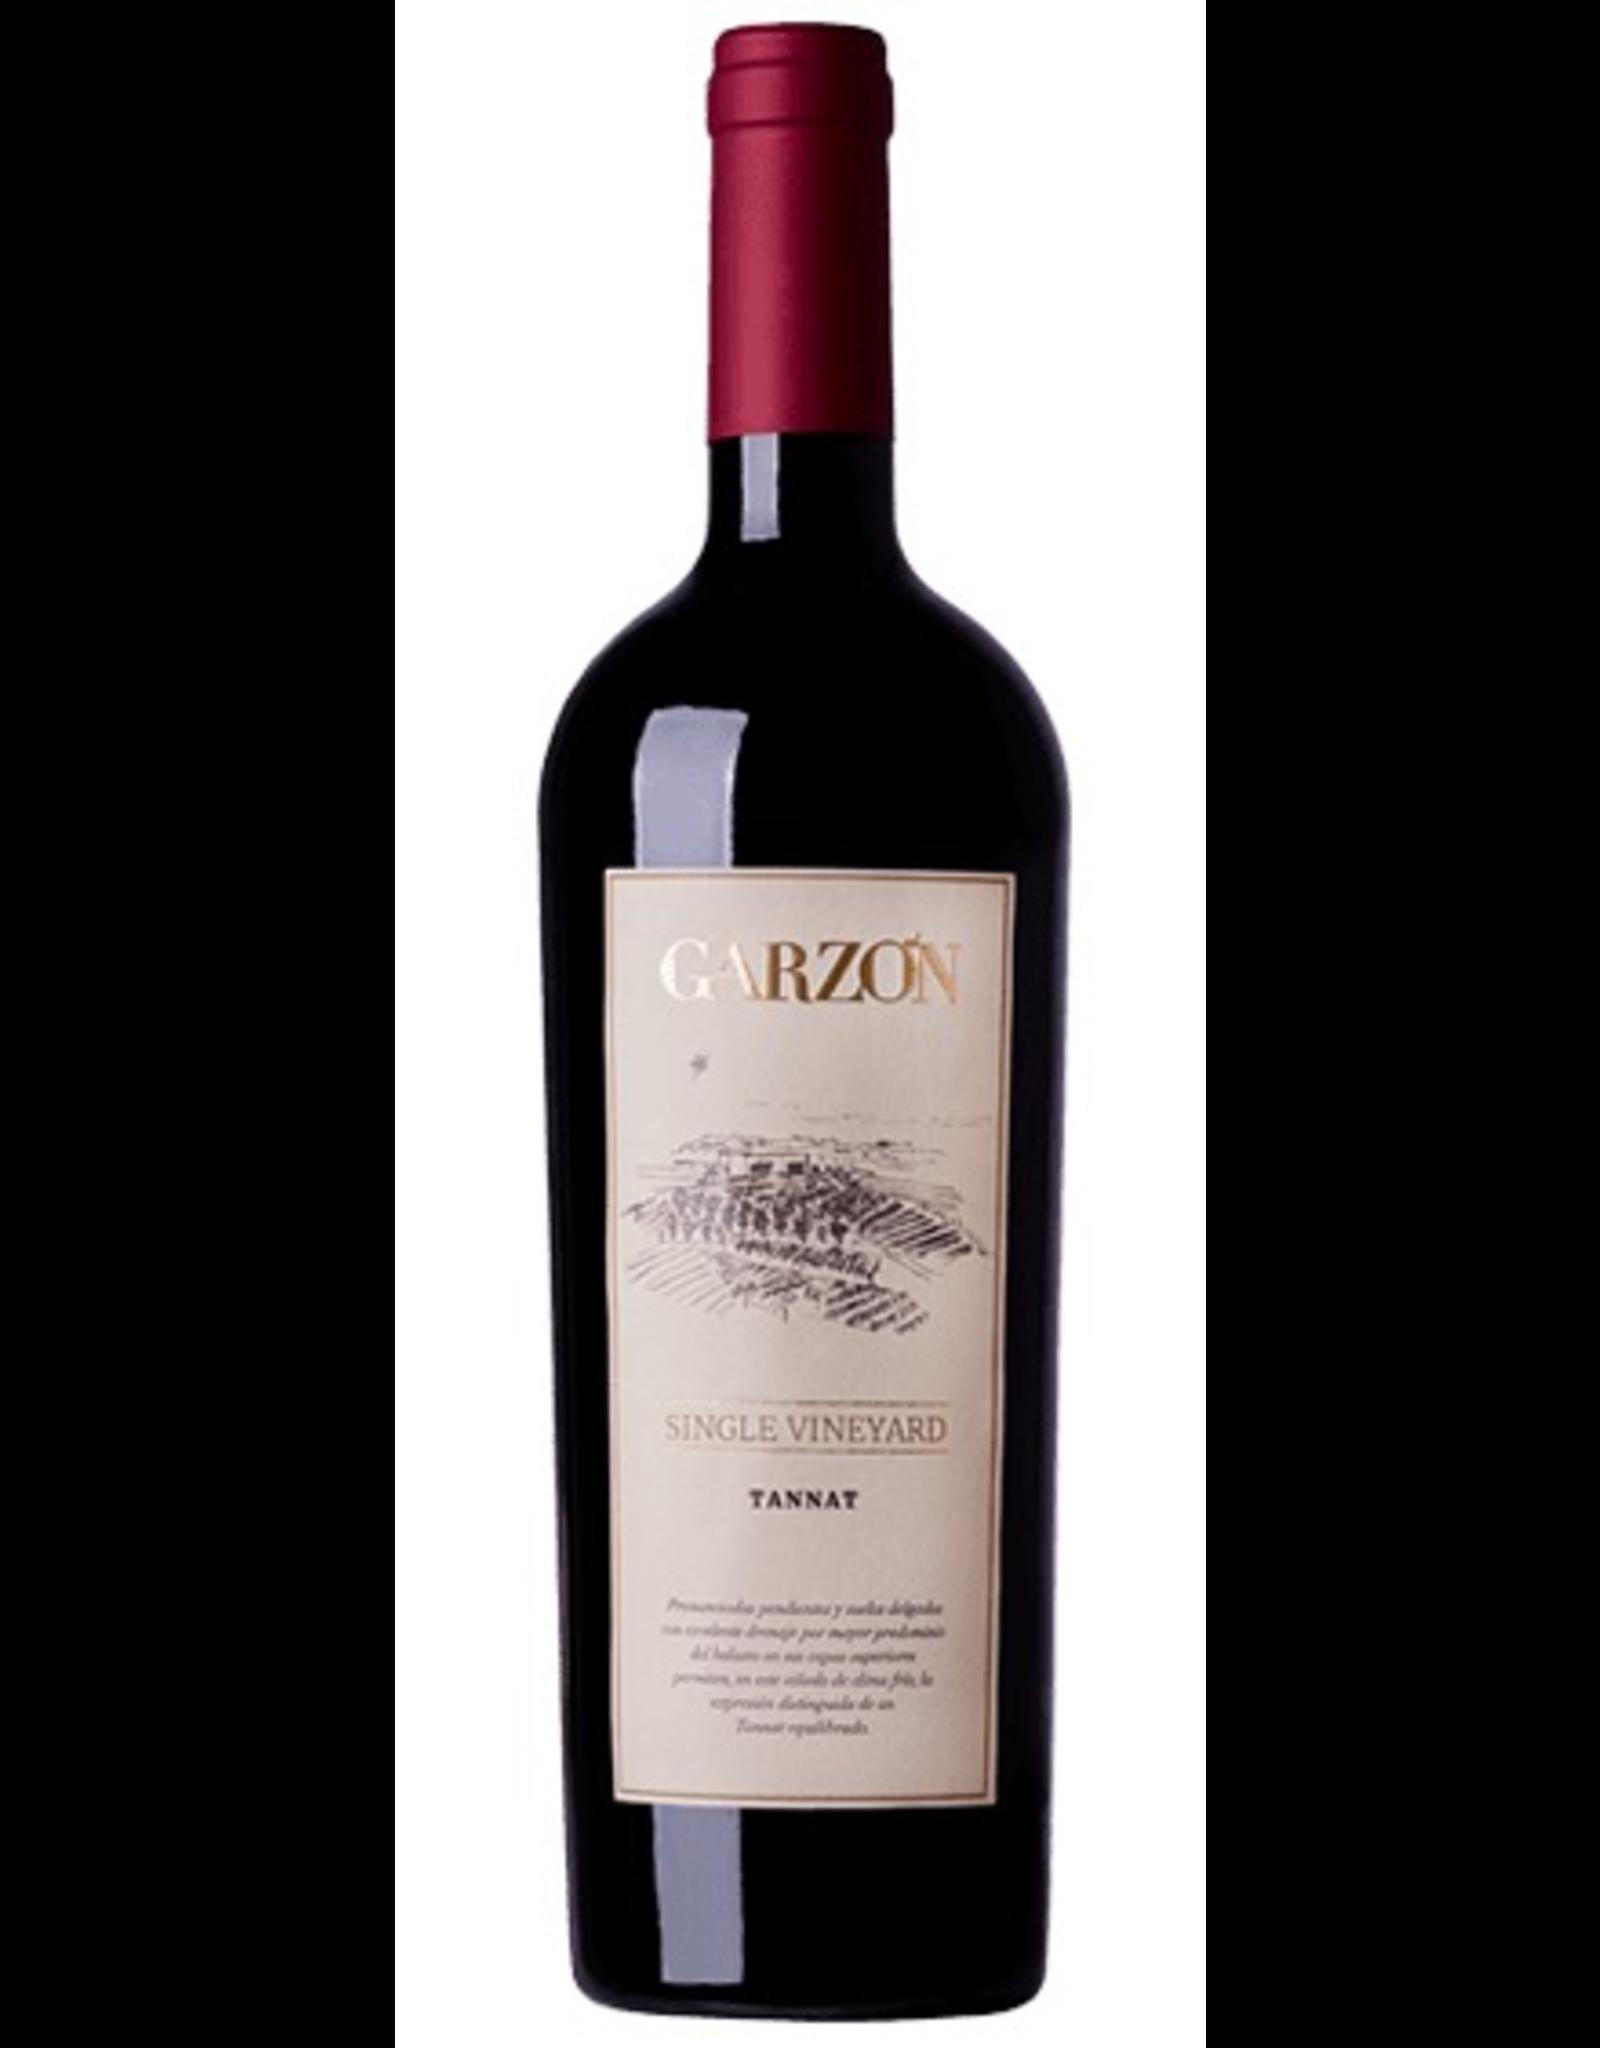 Red Wine 2017, Garzon Single Vineyard, Tannat, Garzon, Garzon, Uruguay, 14.5% Alc, CT